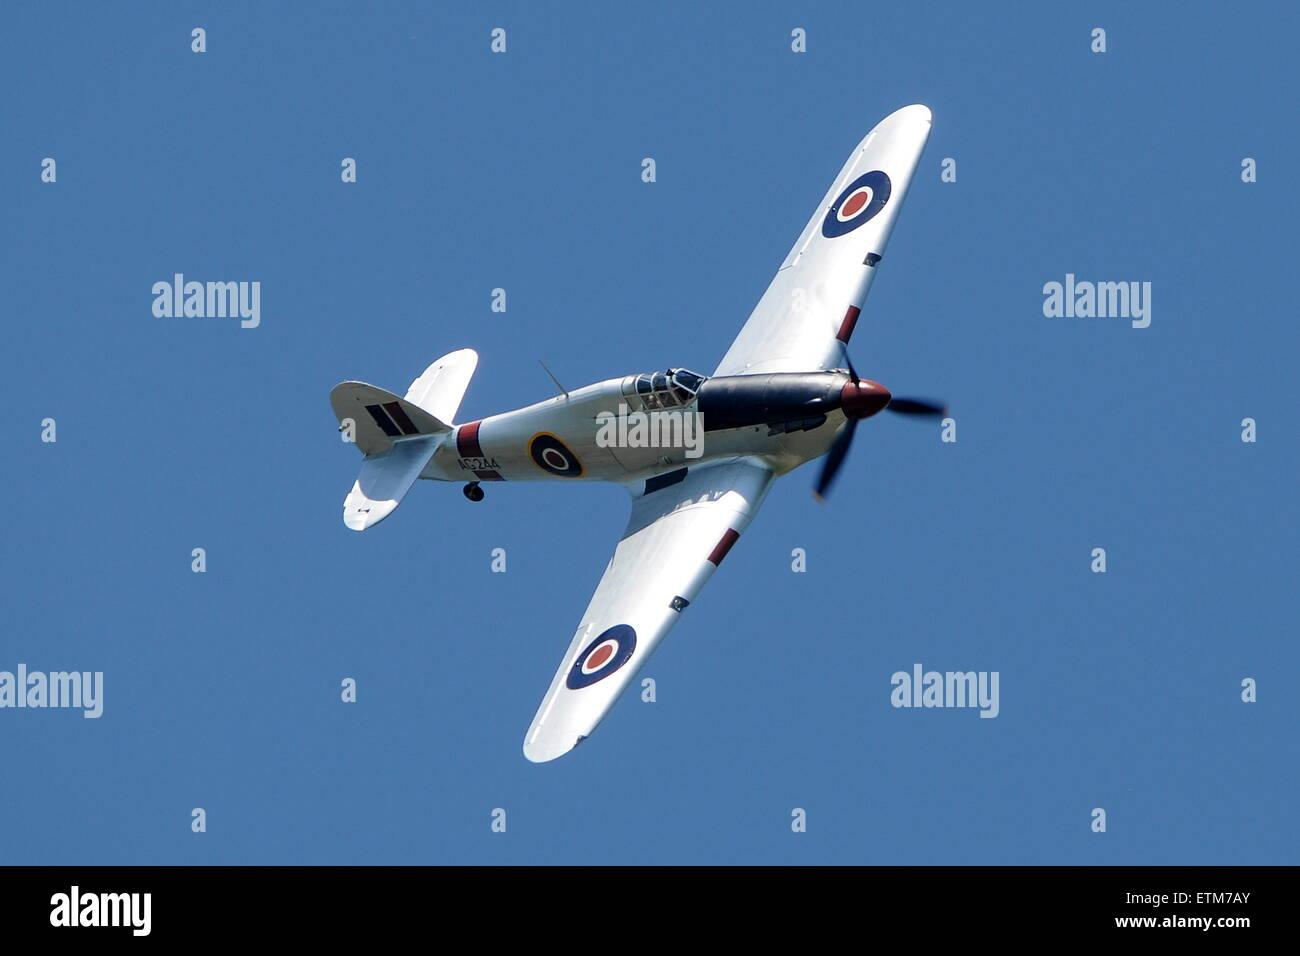 Aviation fair in Pardubice 2015, Hurricane RAF - Stock Image